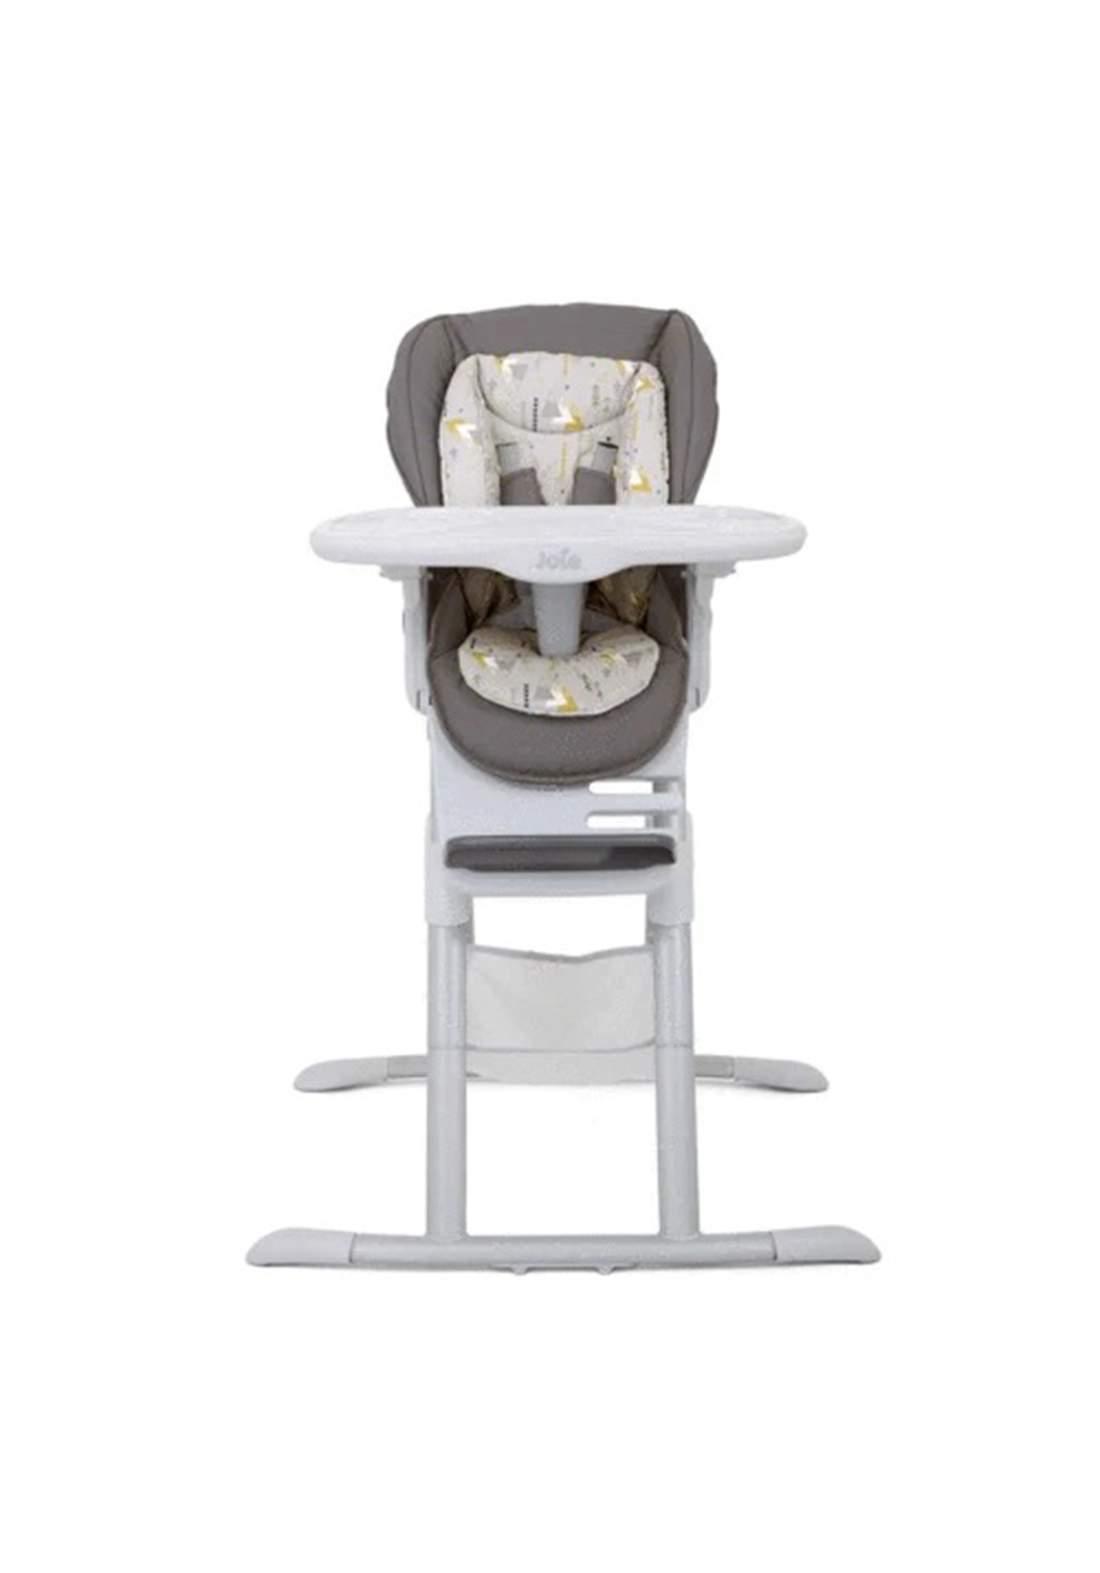 كرسي طعام للاطفال Joie Baby H1124ACGEM000 Mimzy Spin 3-in-1 Highchair Geometric Mountains